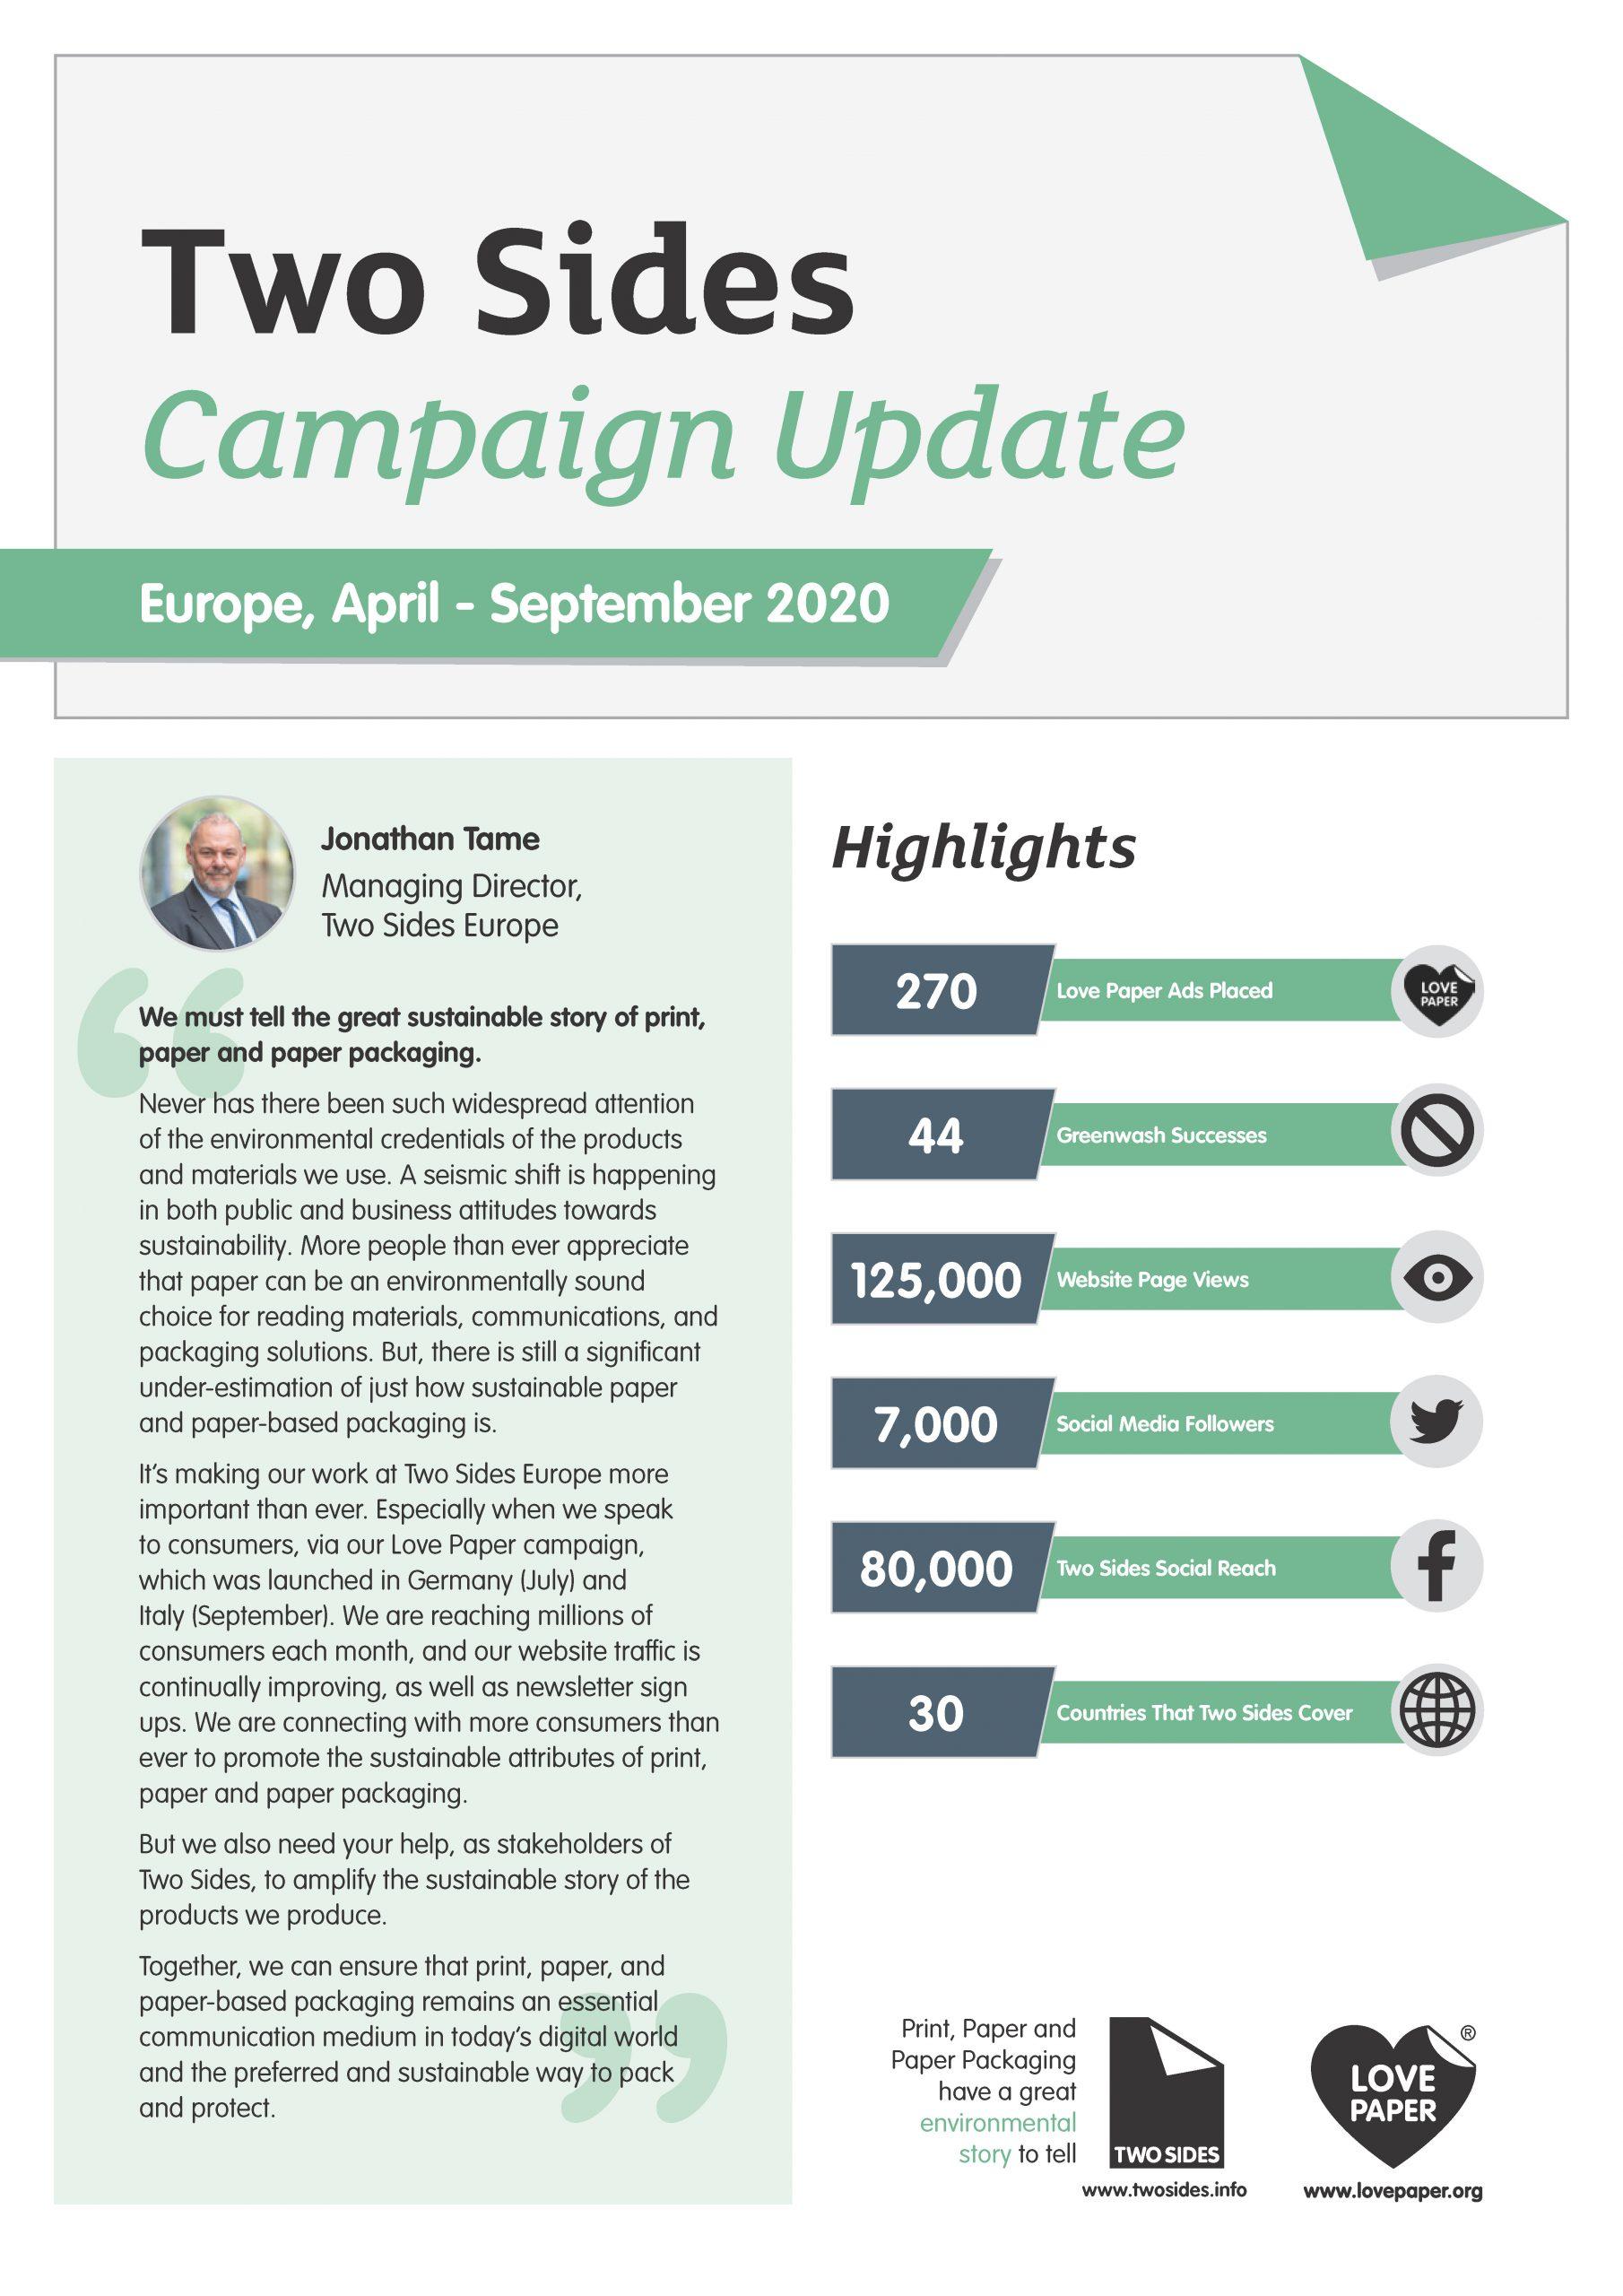 Two-Sides-EU-Campaign-Update-April-Sept-20